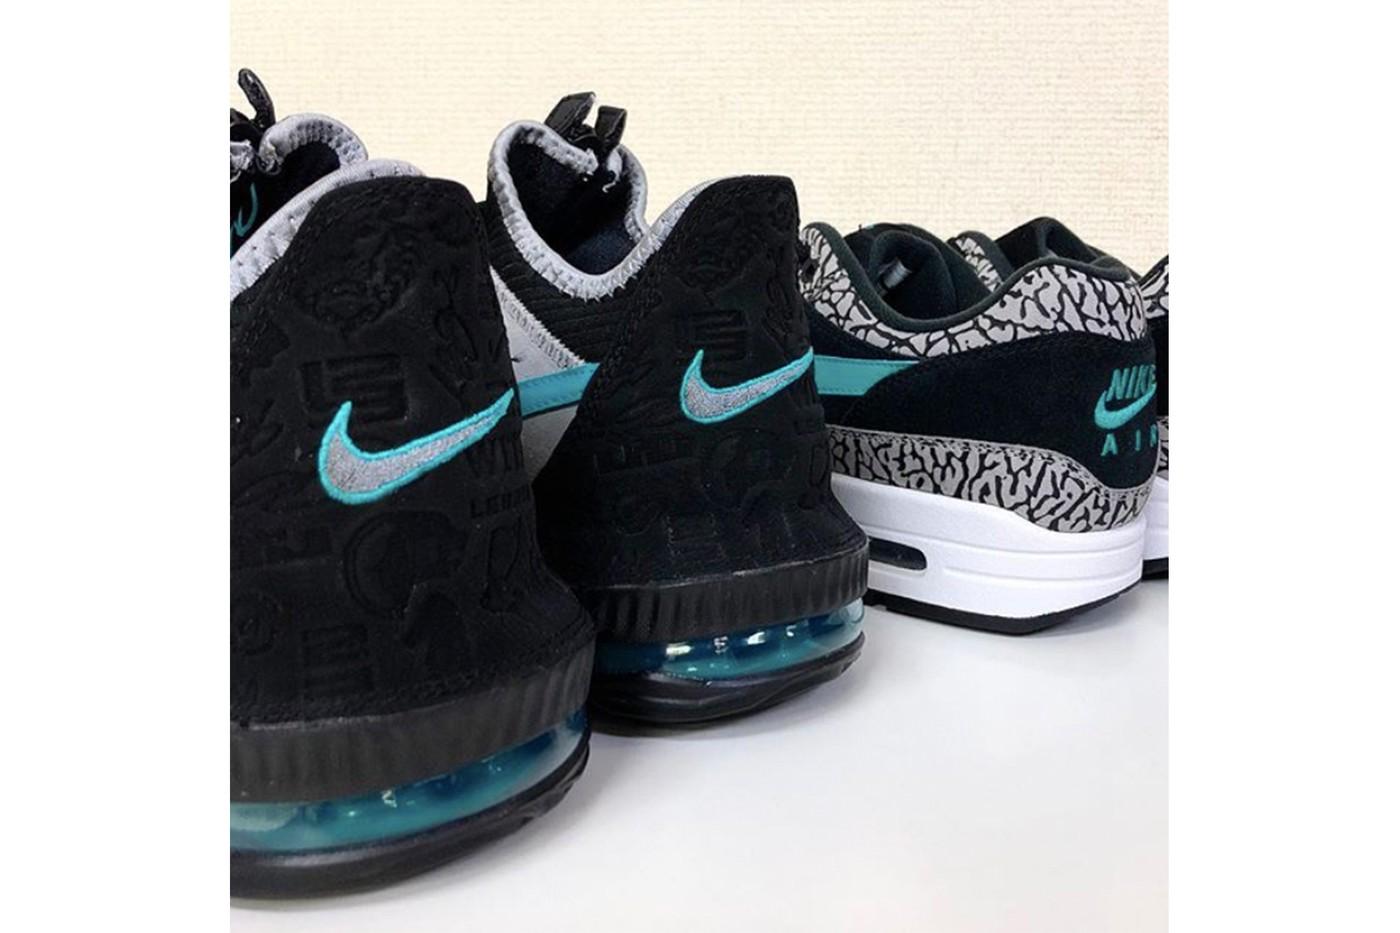 atmos x Nike LeBron 16 Low 移植经典「Elephant」配色曝光?!